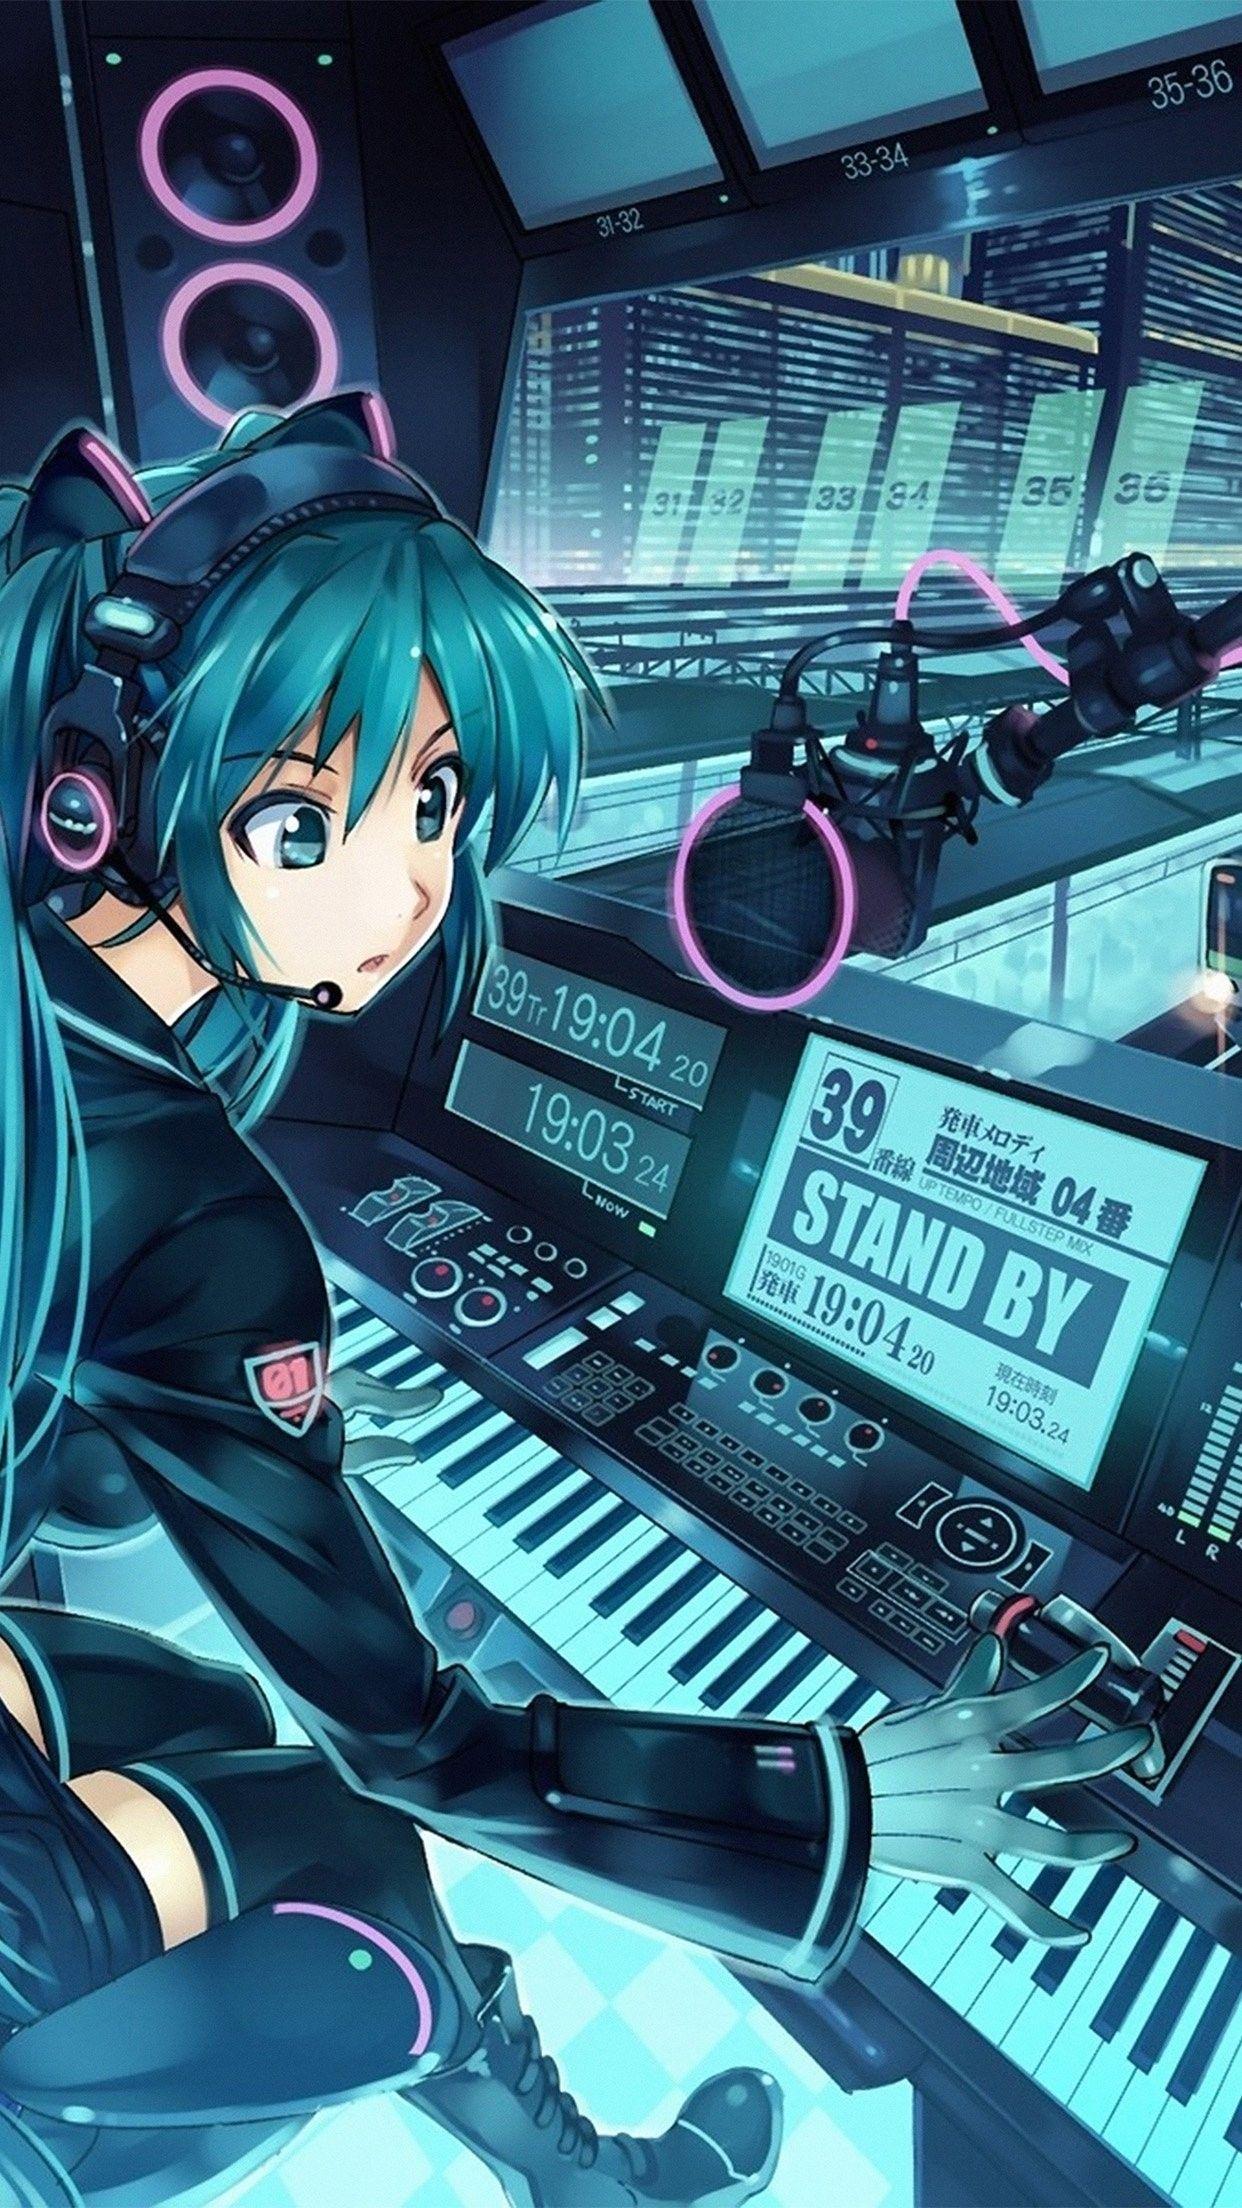 New Anime Wallpaper iPhone 7 Plus Anime neko, Gambar